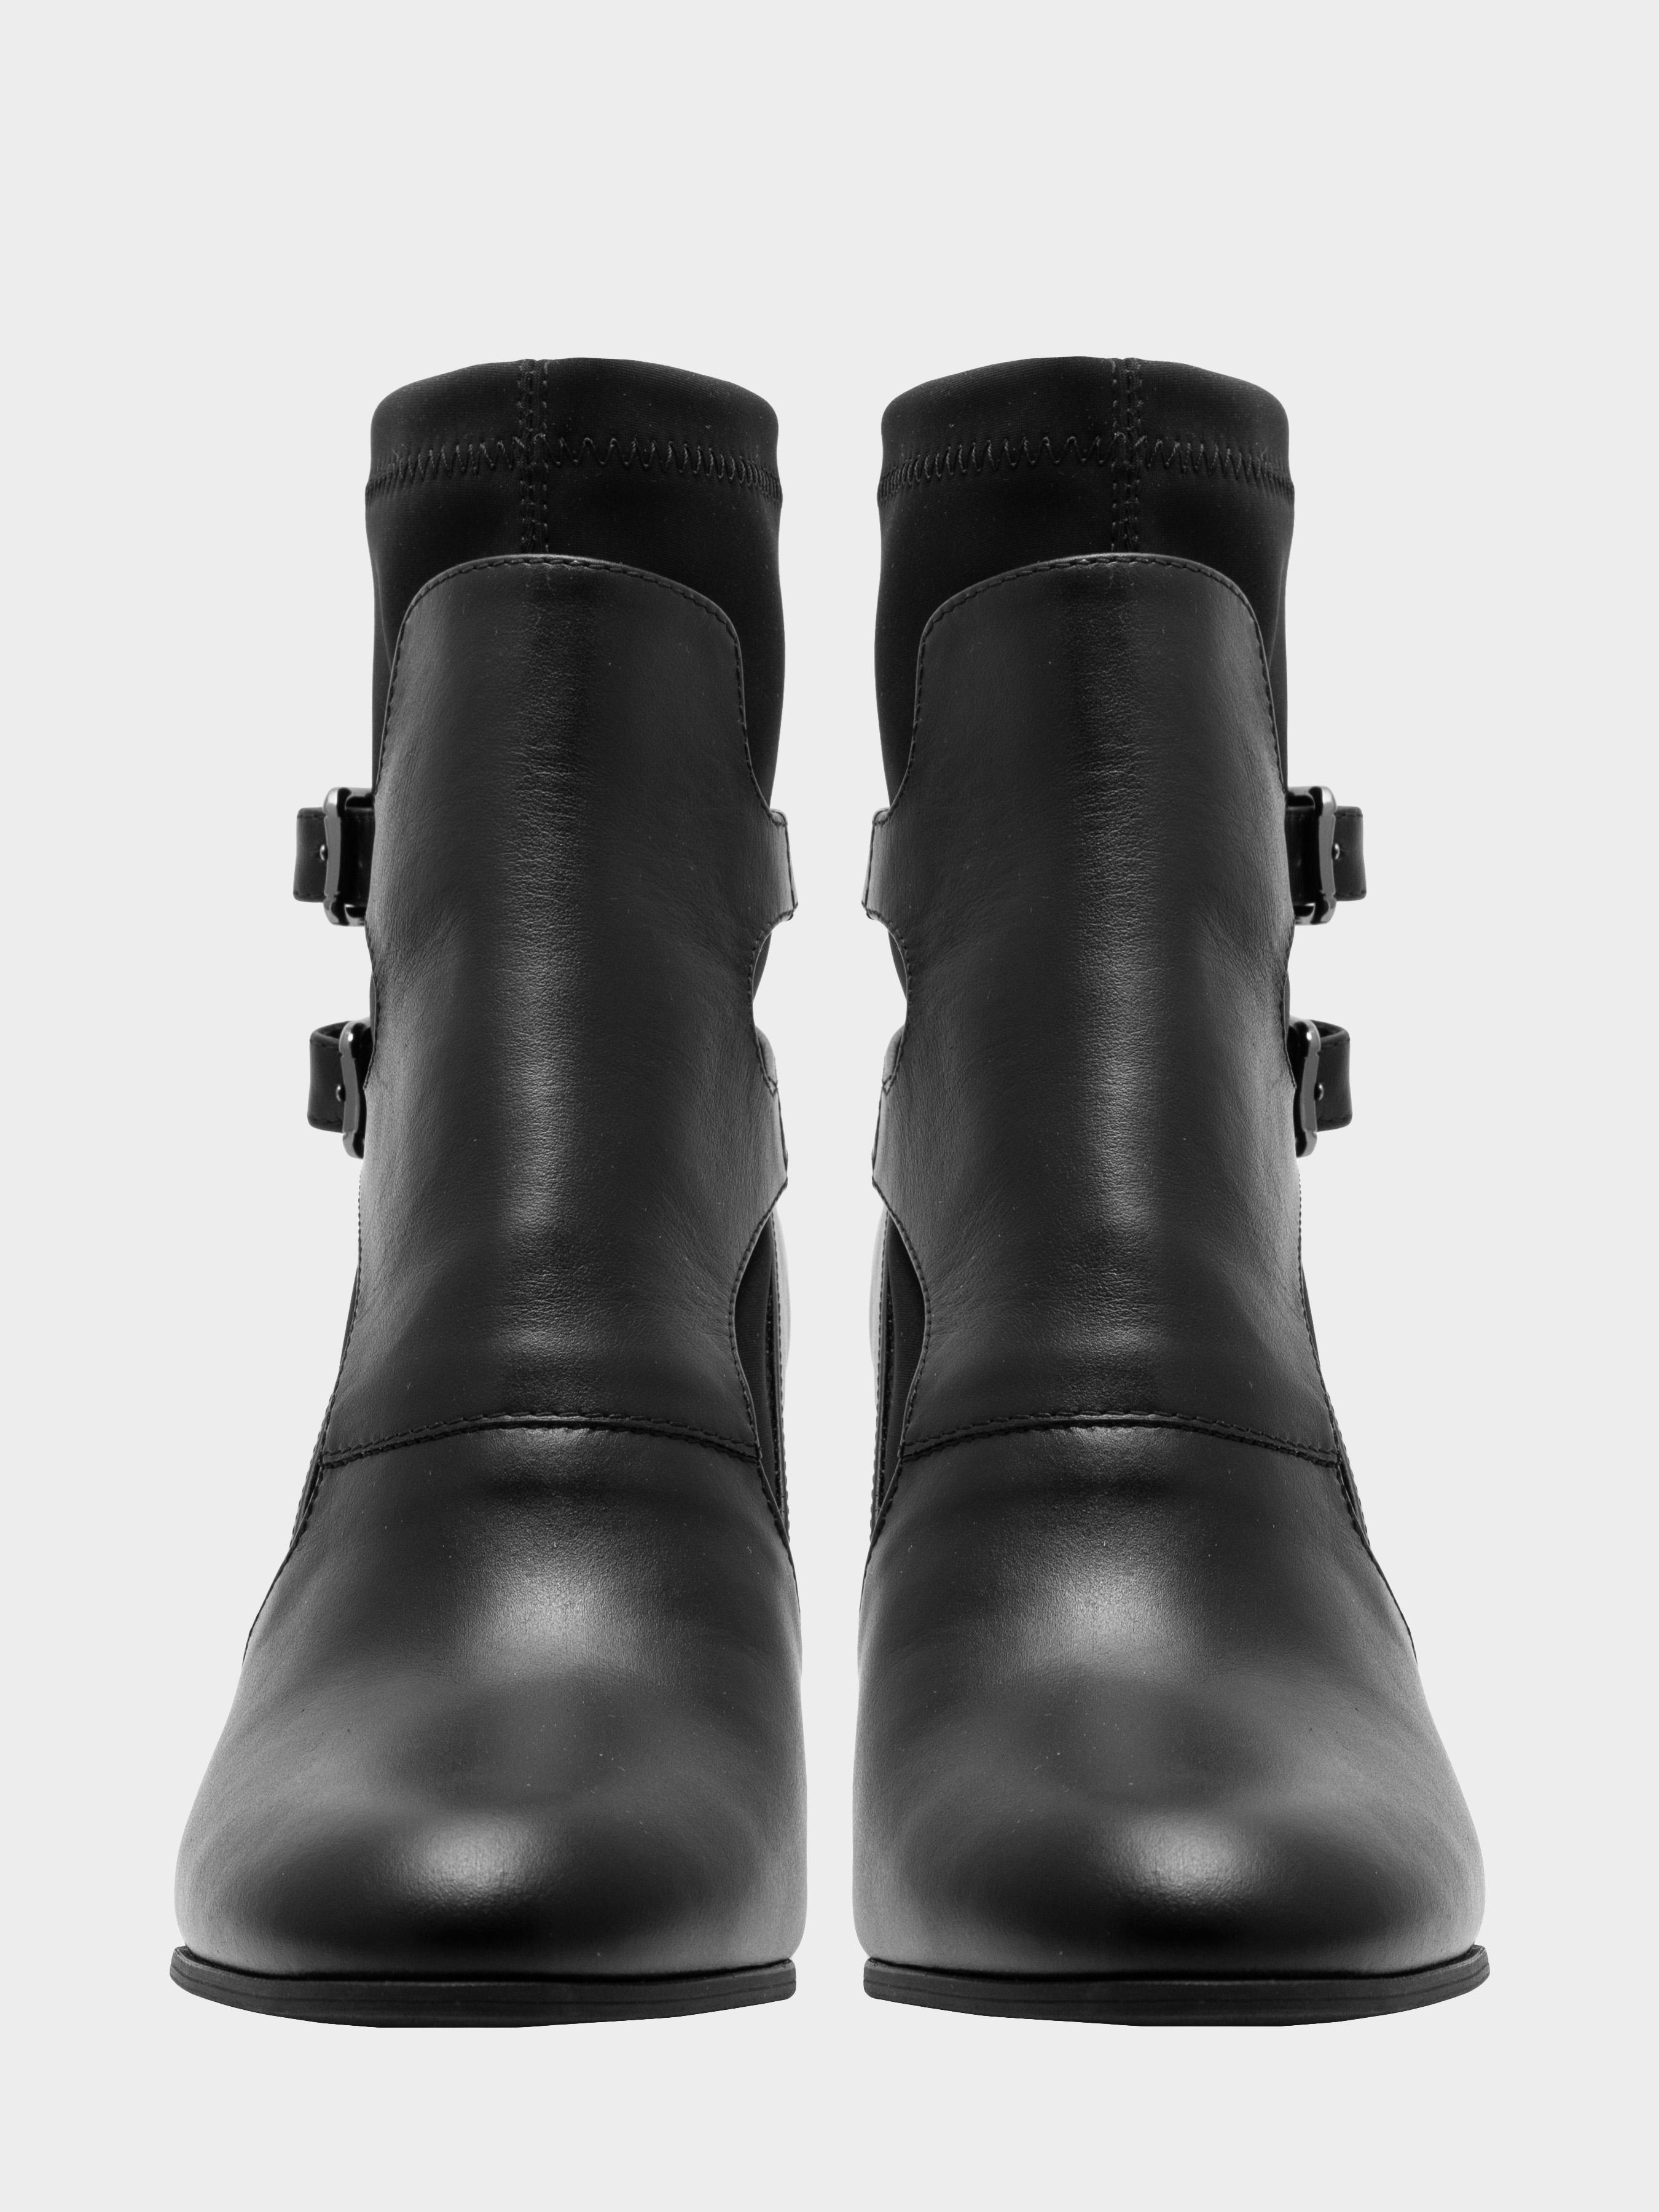 Ботинки для женщин Ботинки женские ENZO VERRATTI 18-9588bl цена, 2017